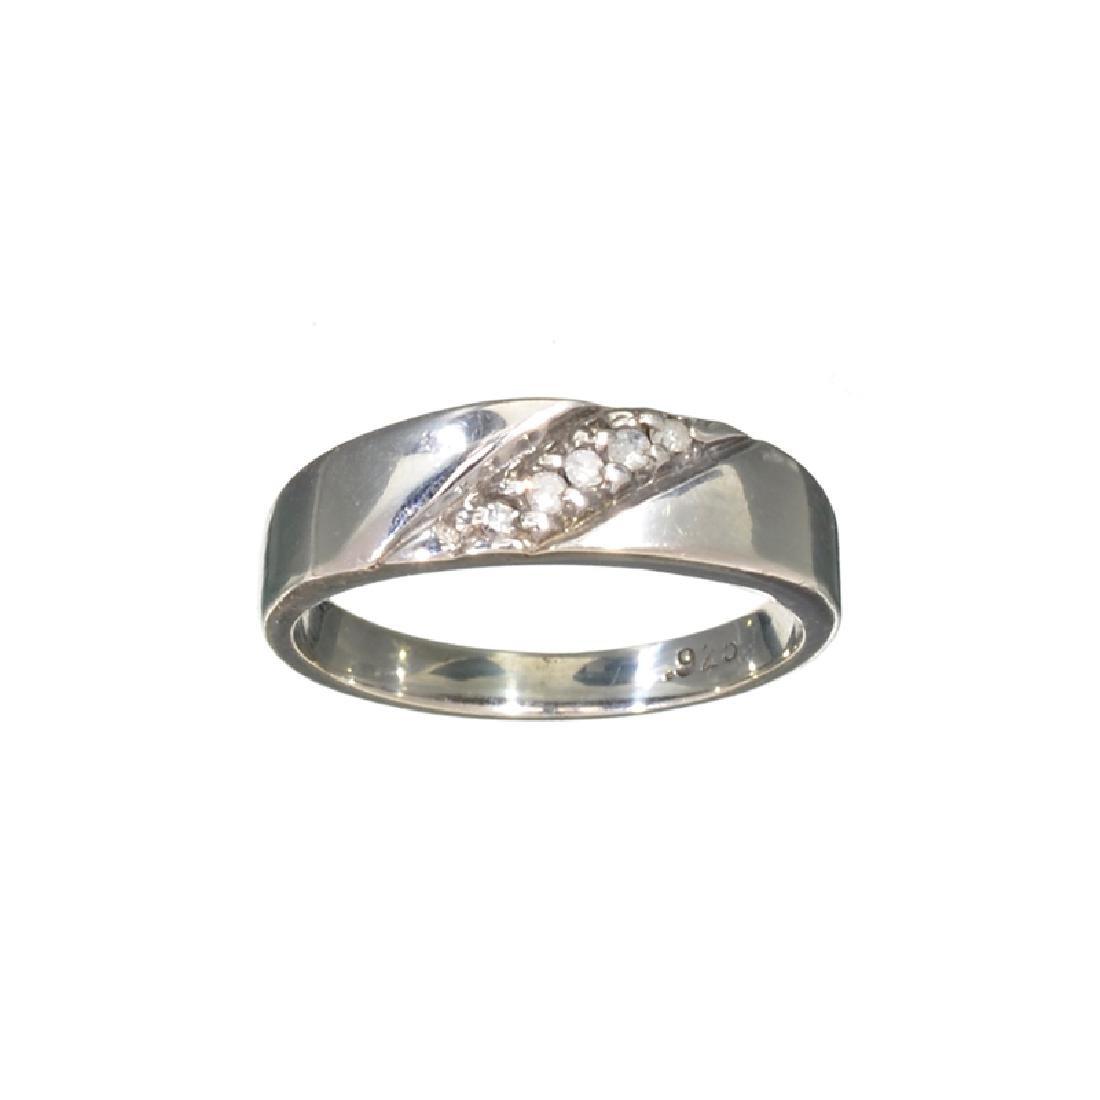 APP: 0.3k Fine Jewelry 0.05CT Single Cut Diamond And